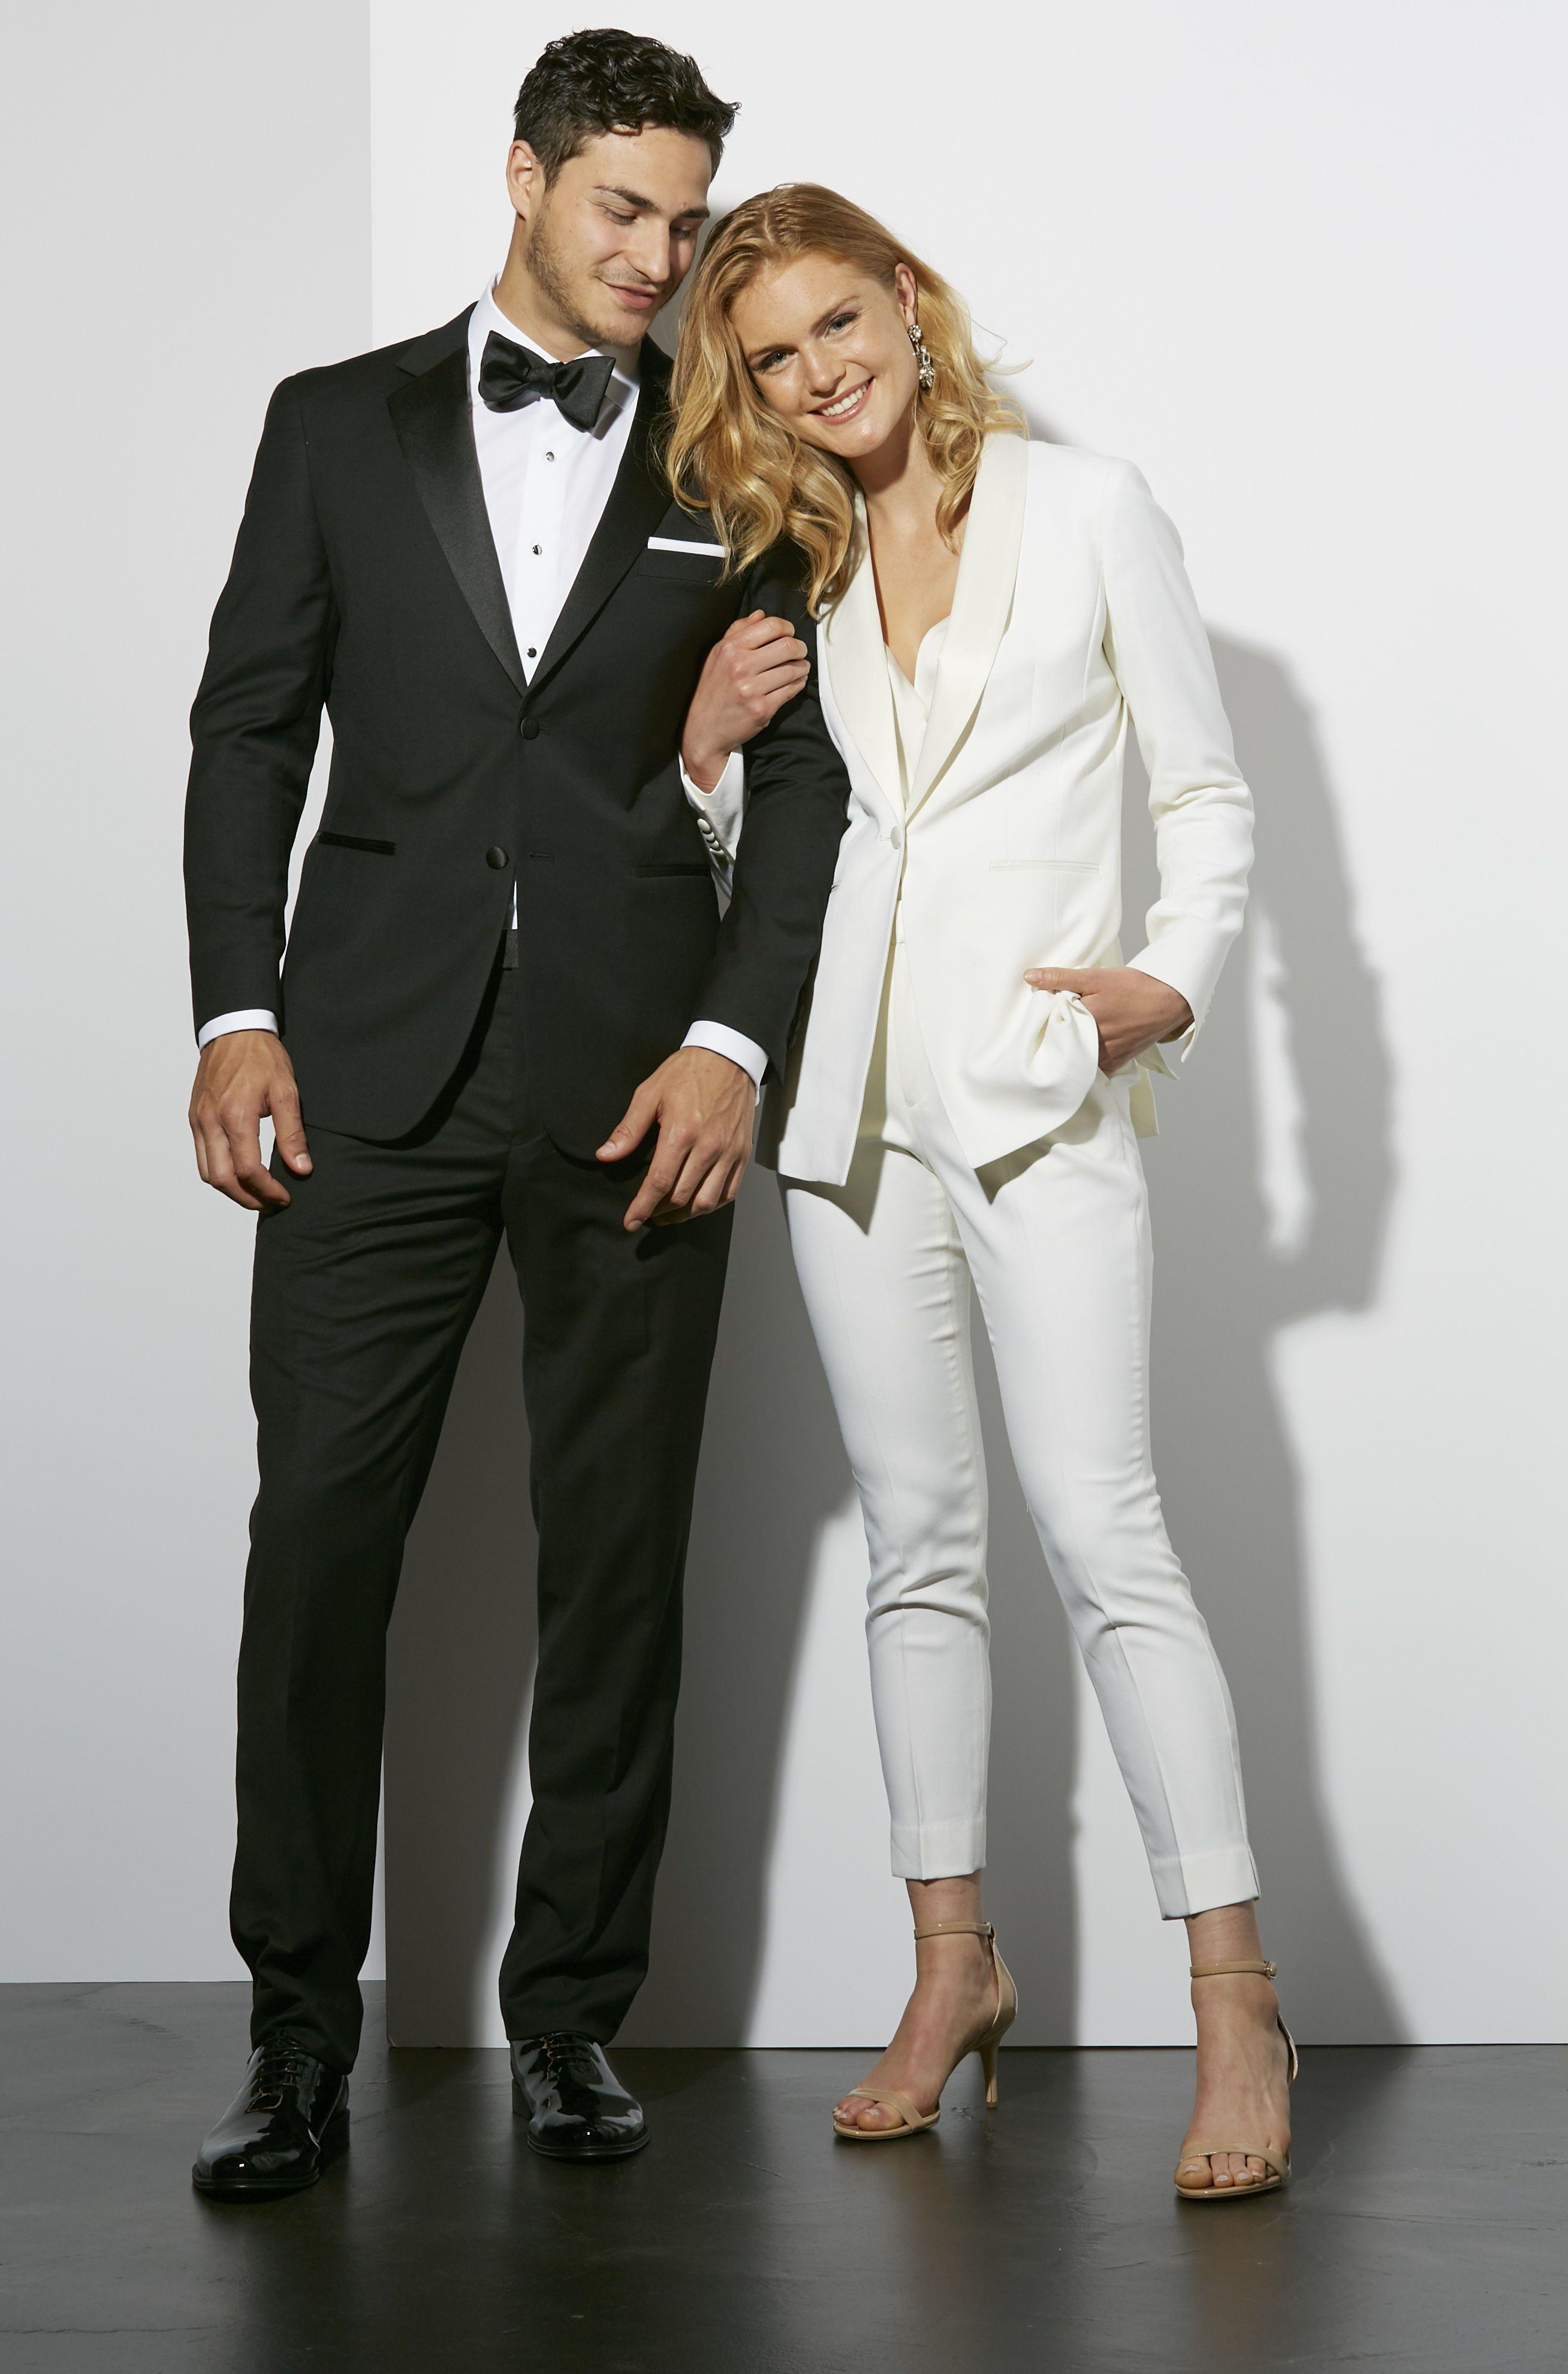 Womens Wedding Suit in White   The Groomsman Suit   Women